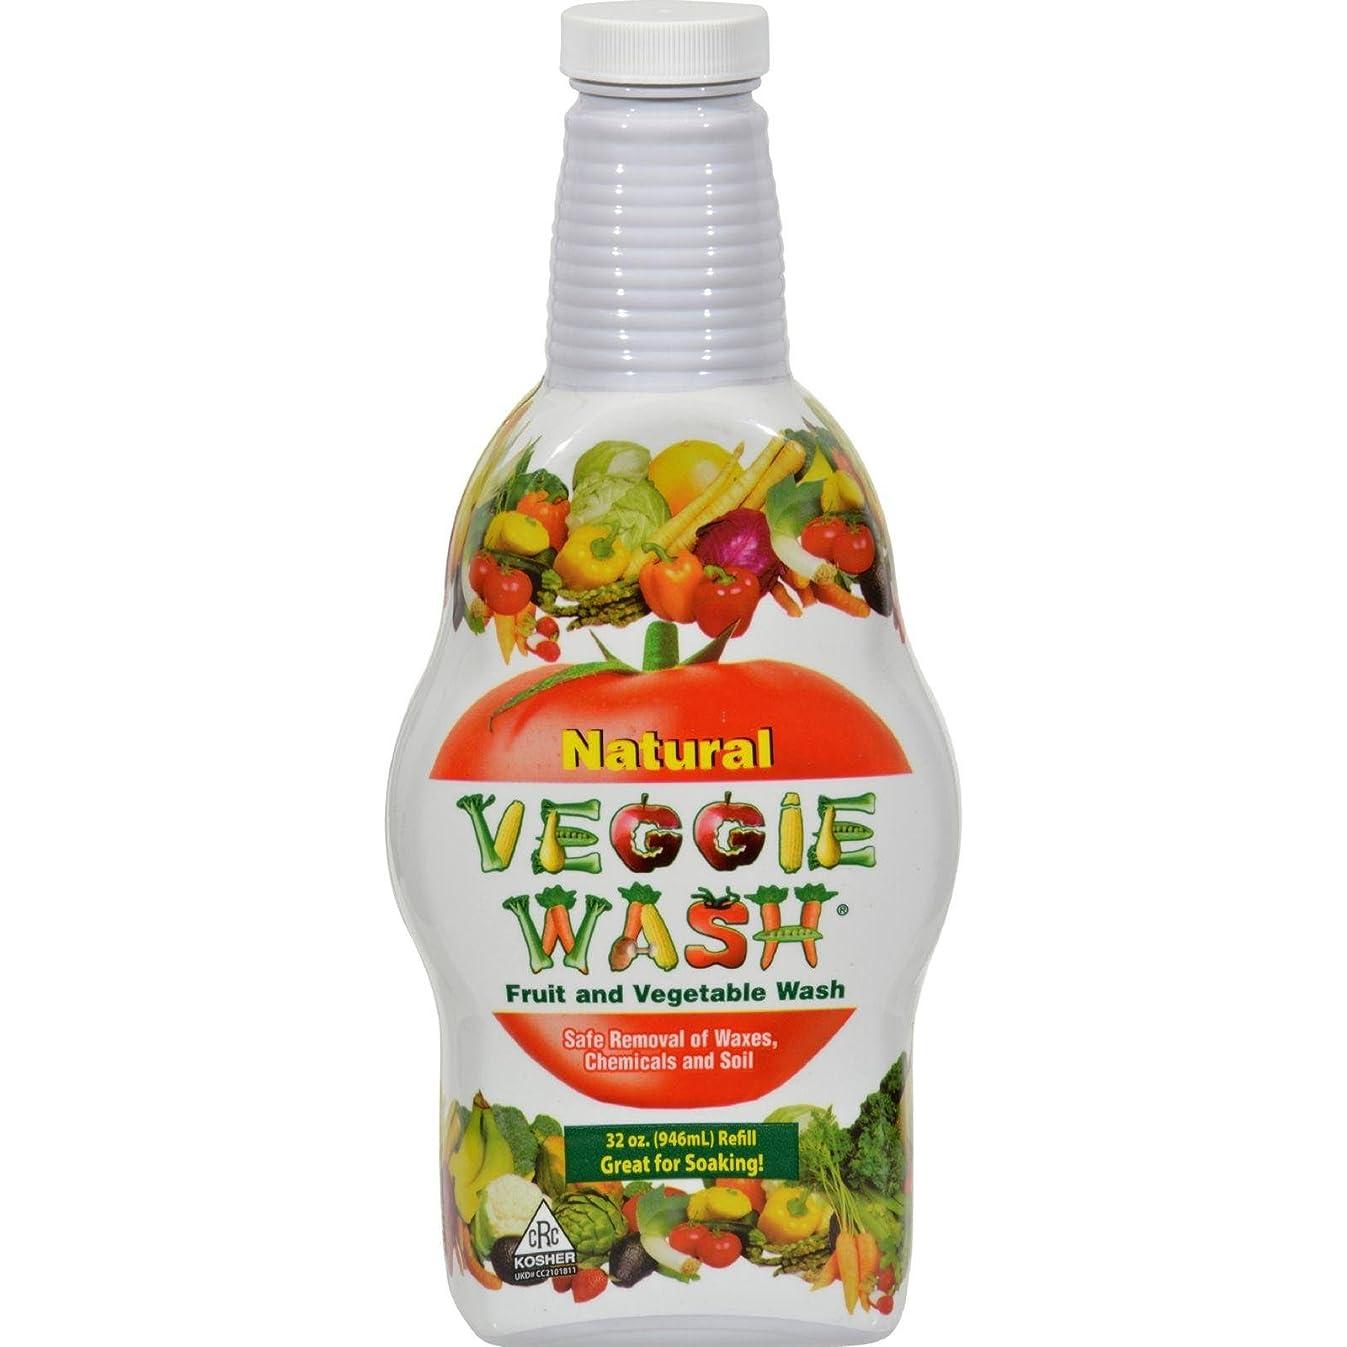 Veggie Wash Citrus Magic Natural Fruit and Vegetable Refill, 32 Fluid Ounce